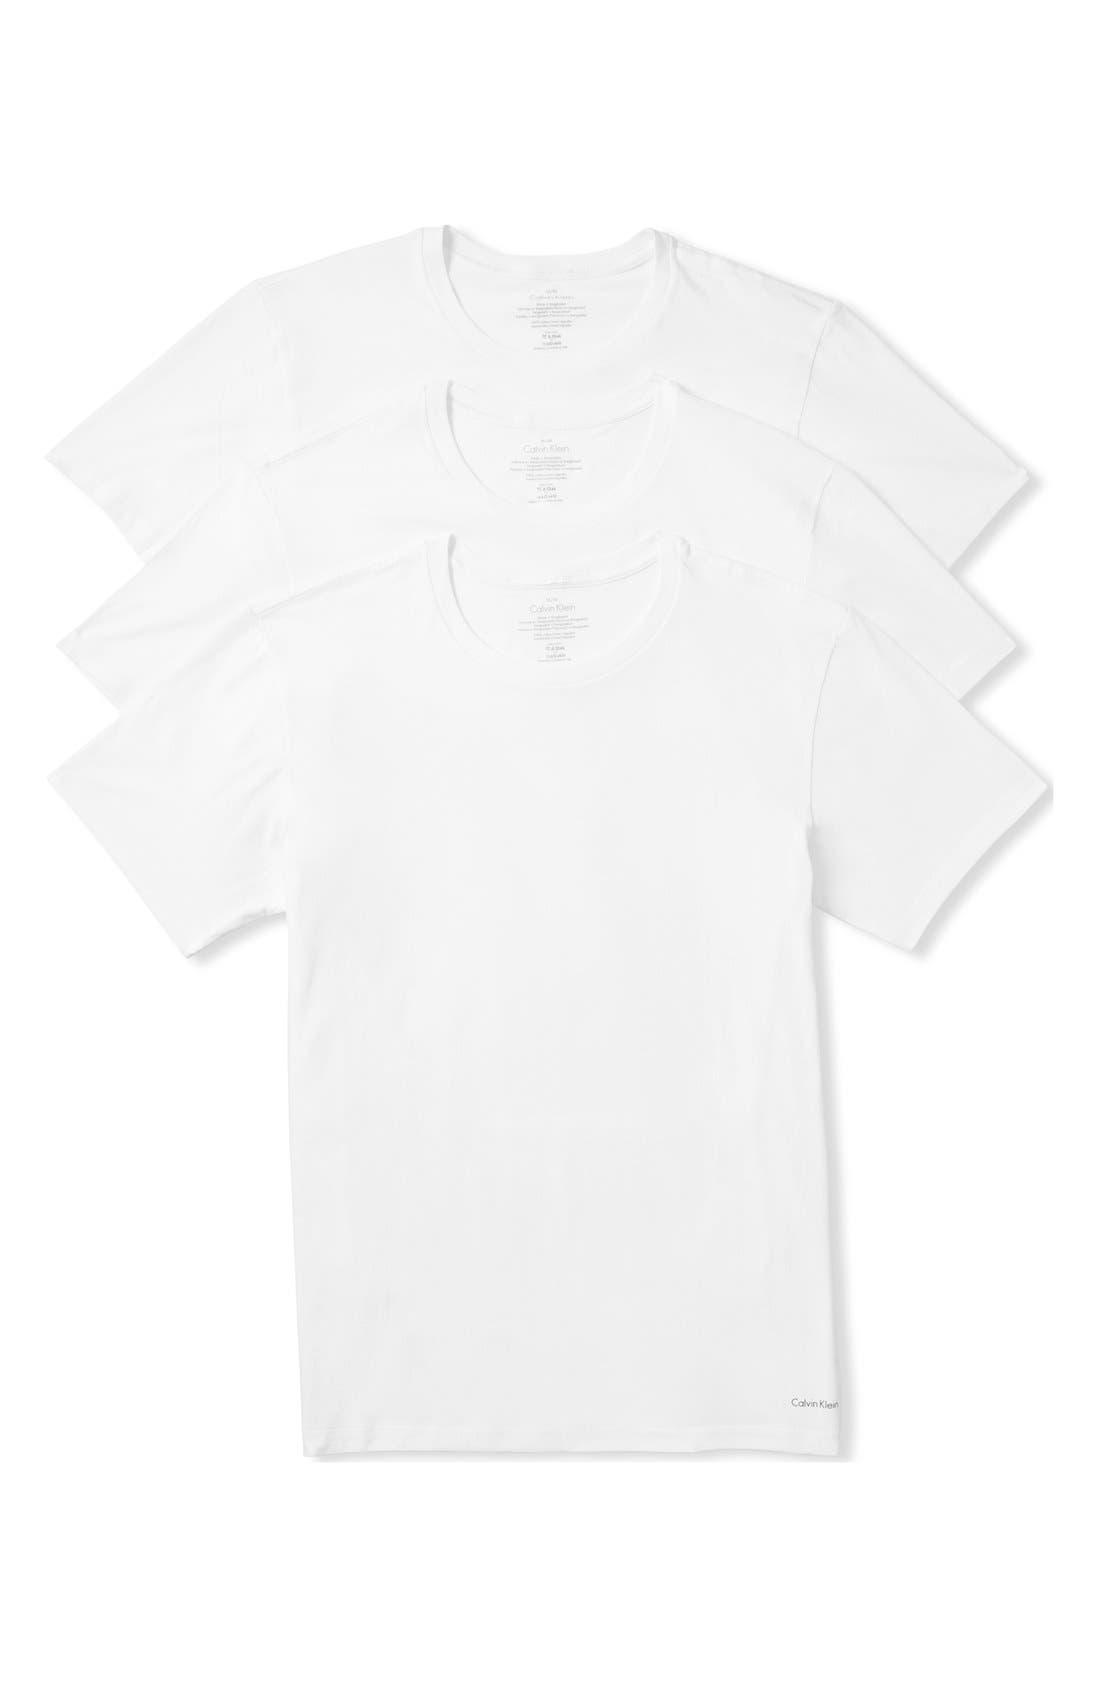 3-Pack Cotton T-Shirt,                         Main,                         color, WHITE